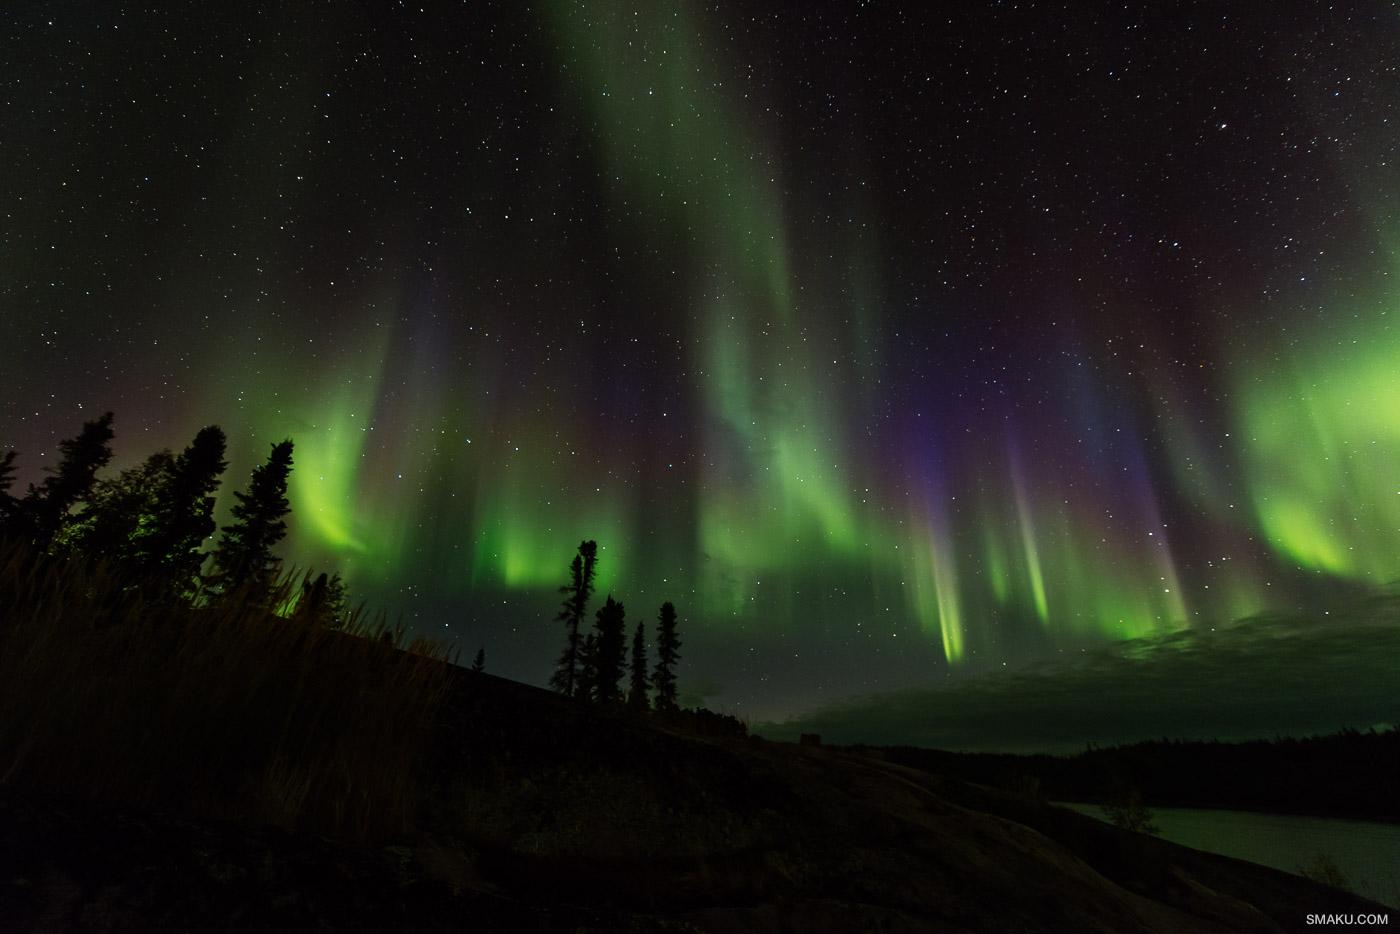 The vibrant colours of the Aurora Borealis